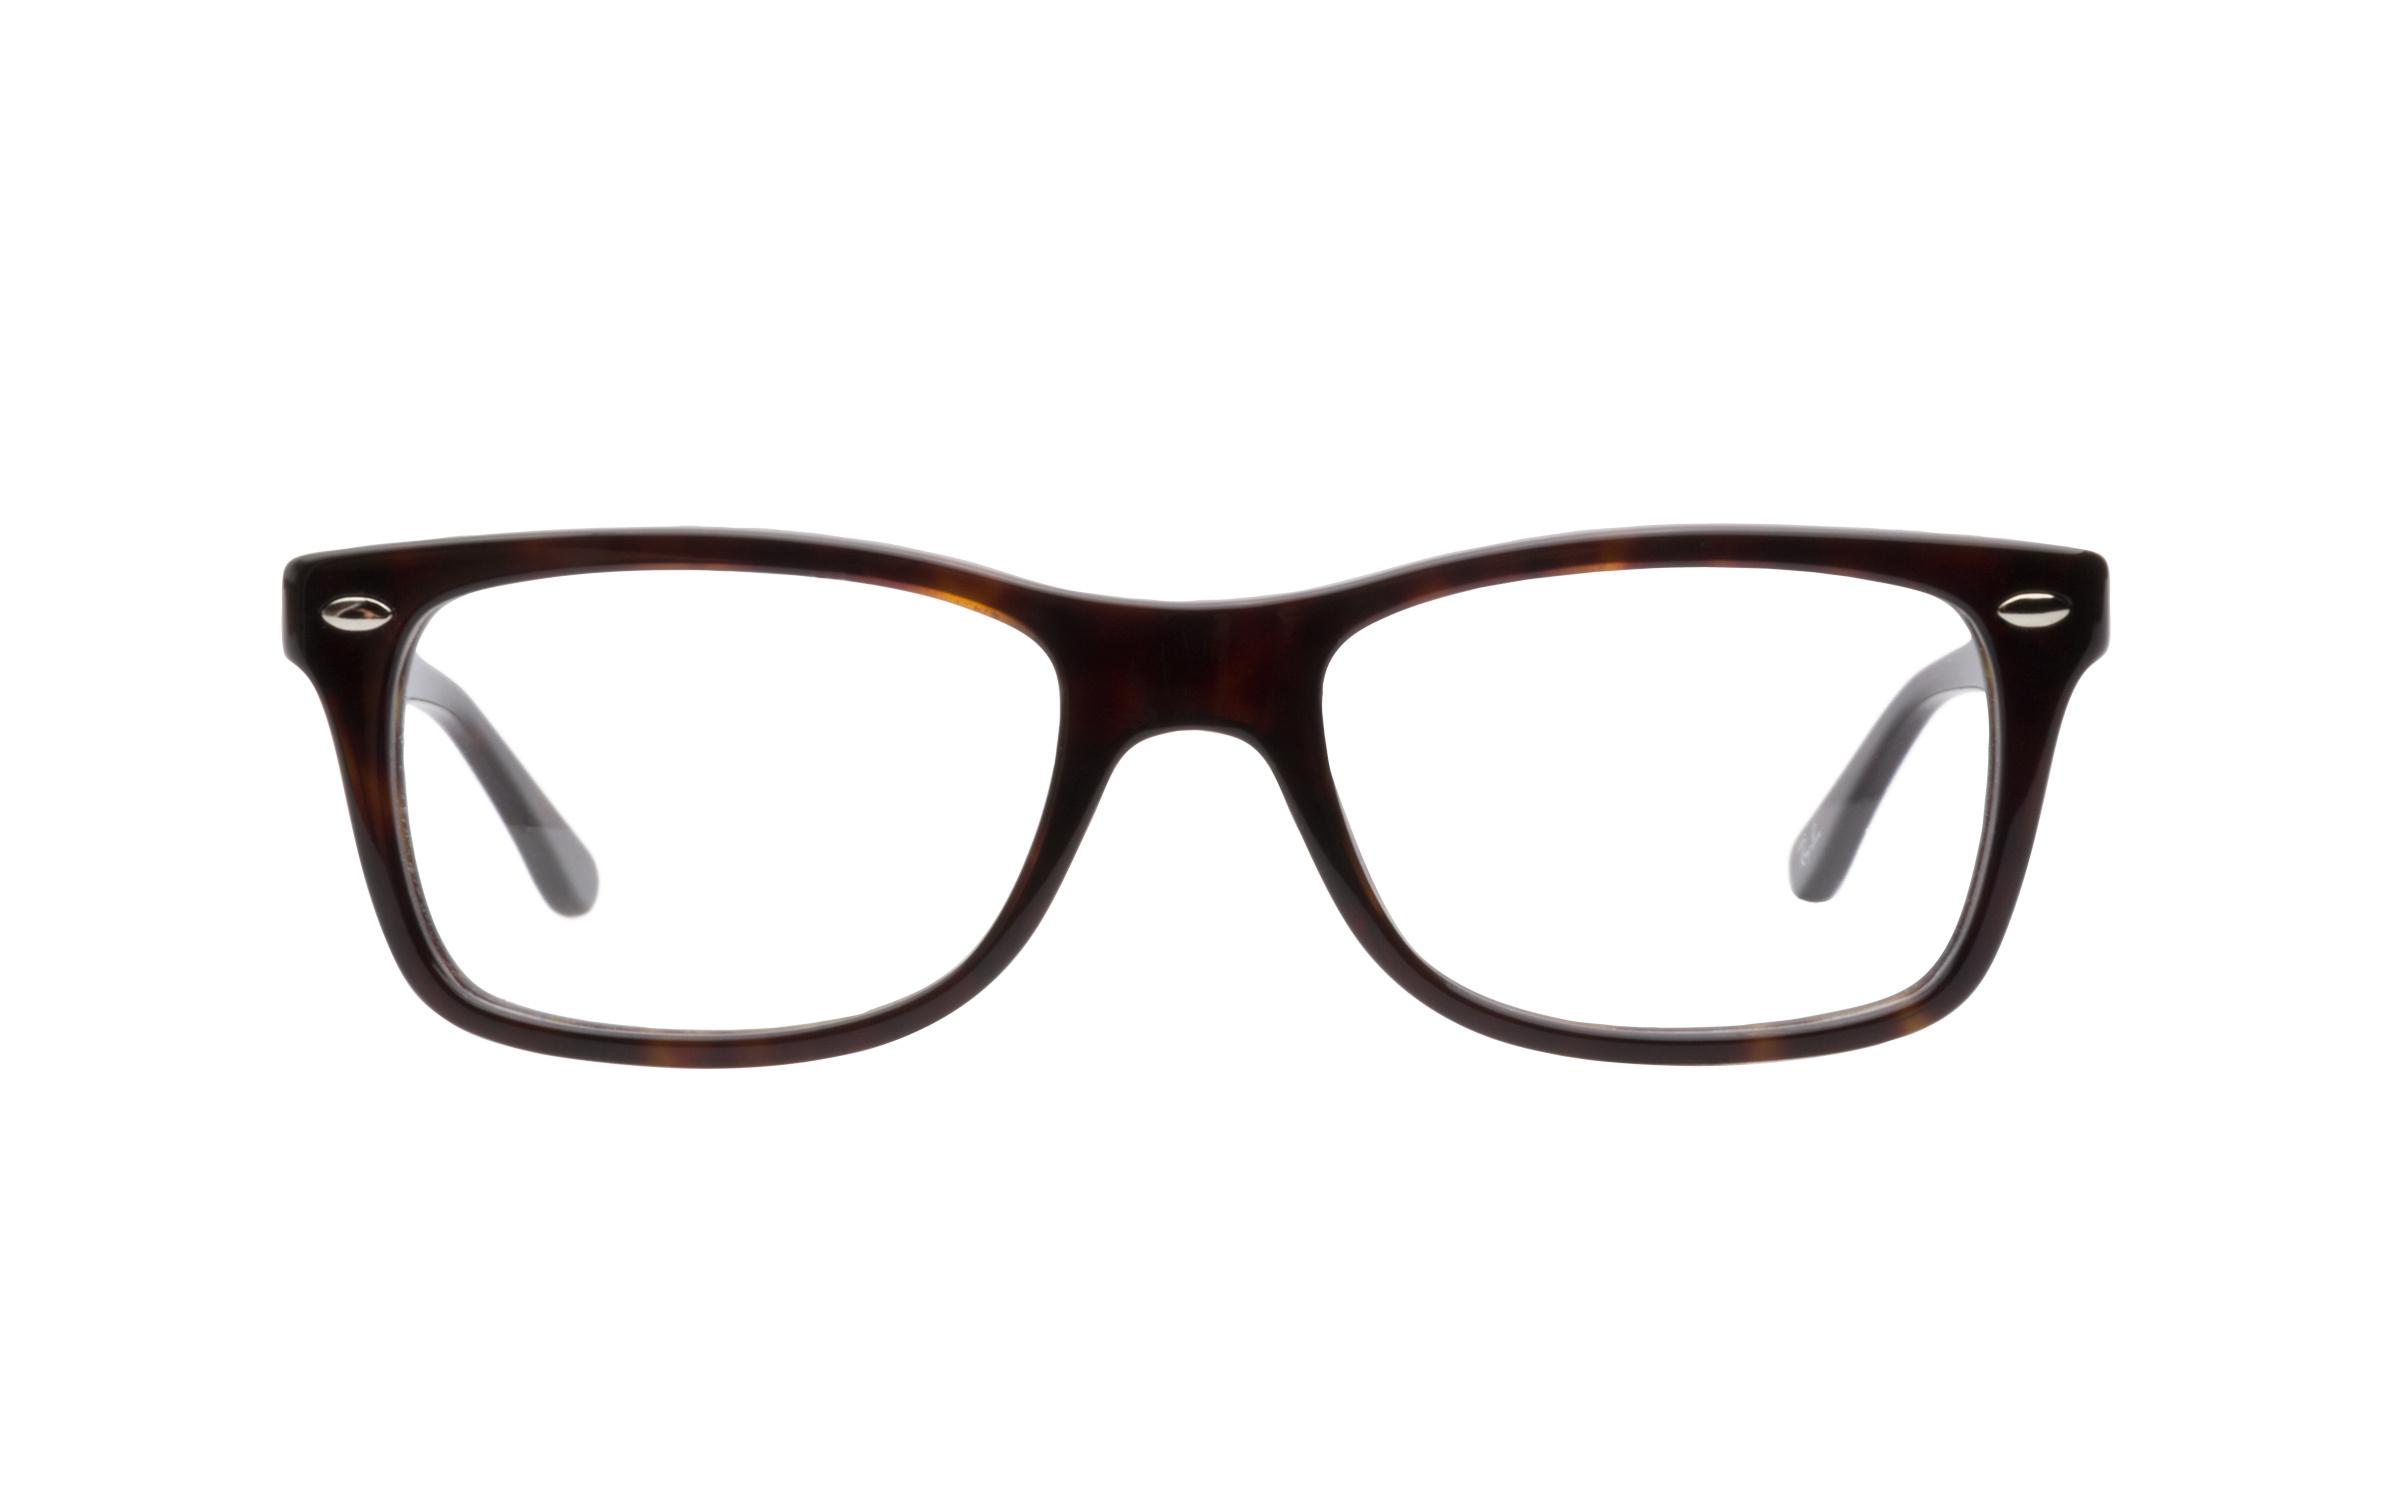 RayBan_Glasses_Retro_Brown_AcetateMetal_Online_Coastal